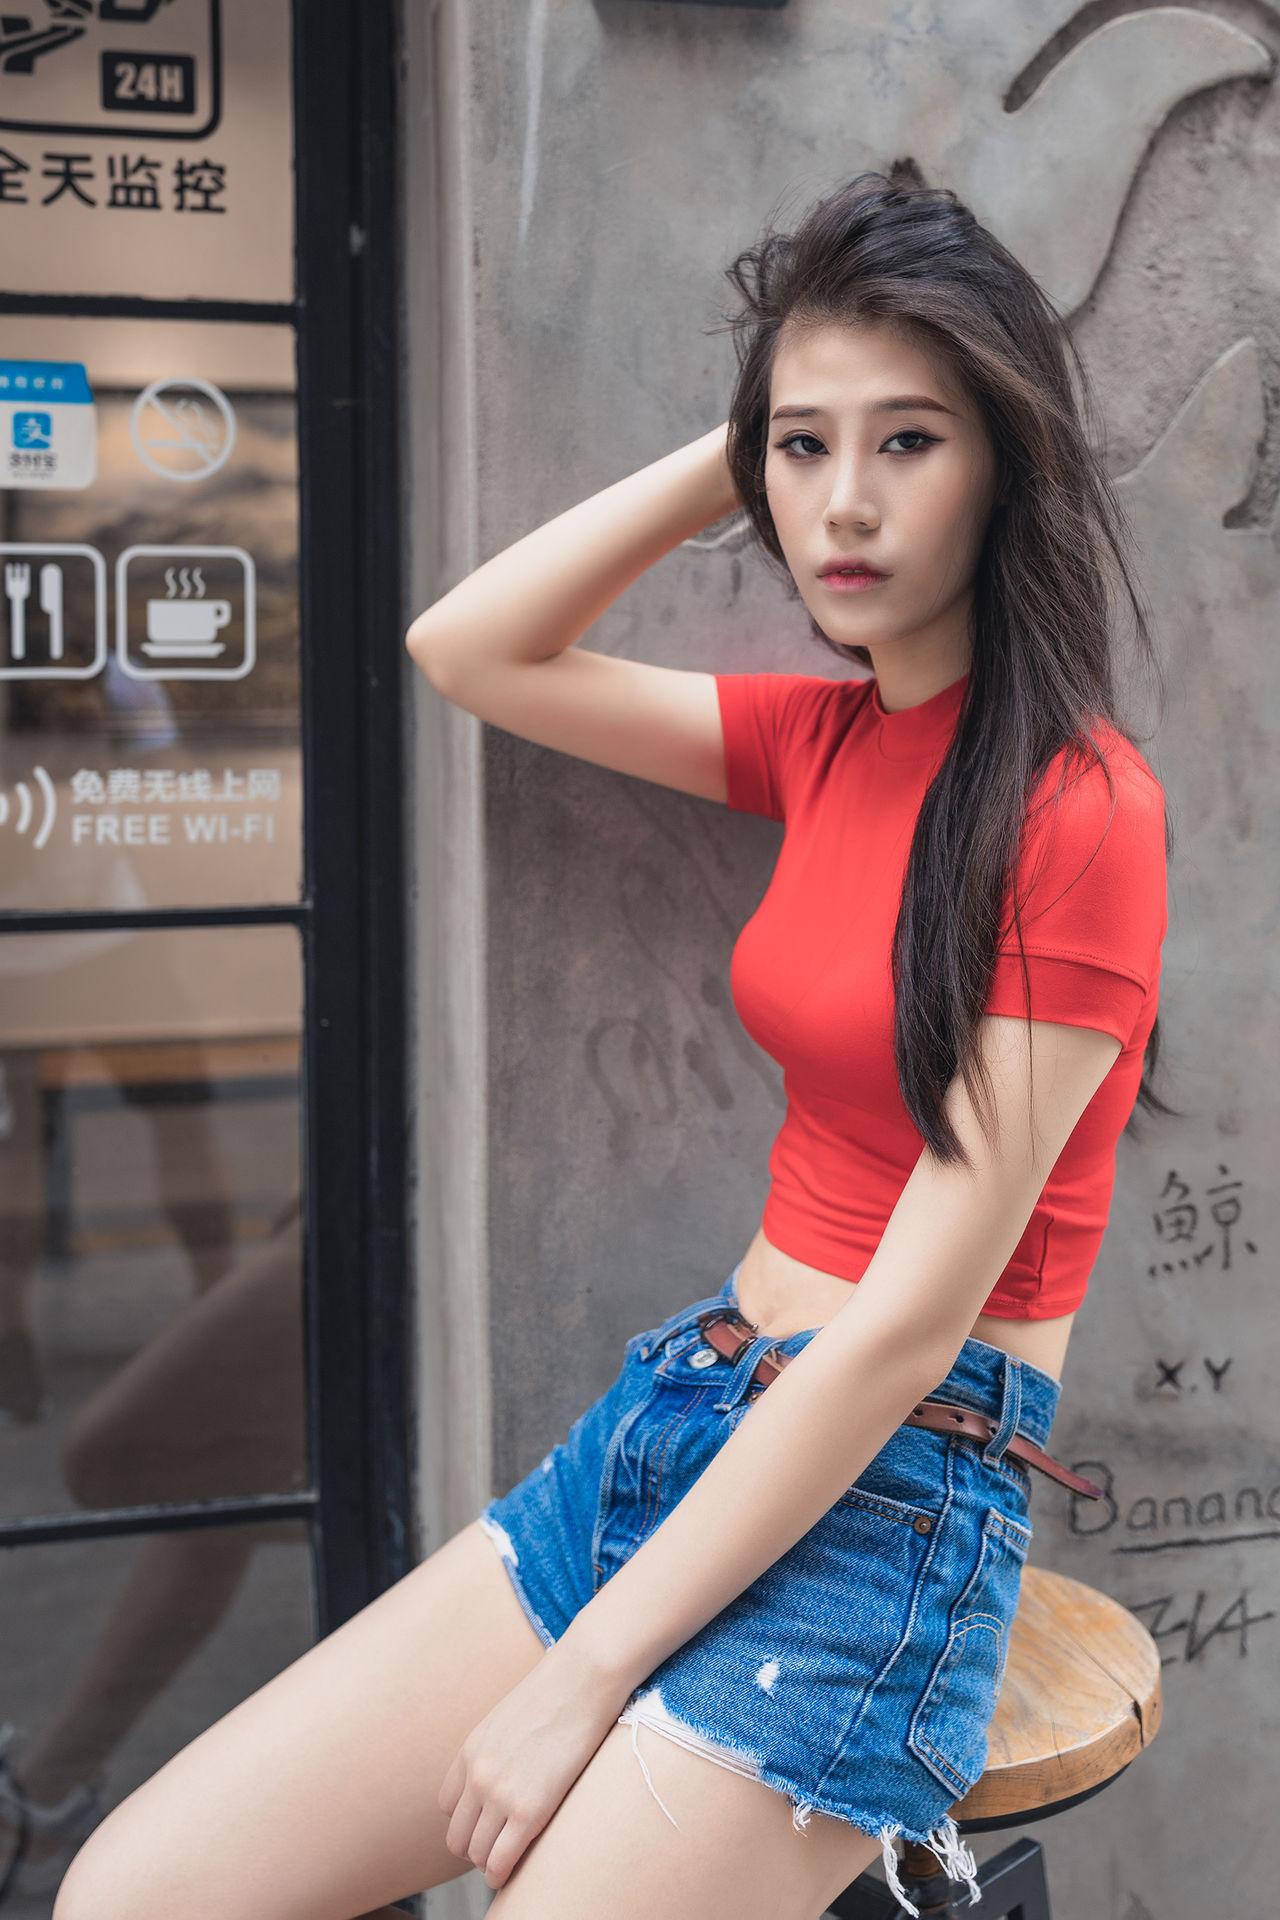 2018-09-06 M50创意园区_摄影师郭小皓的返片